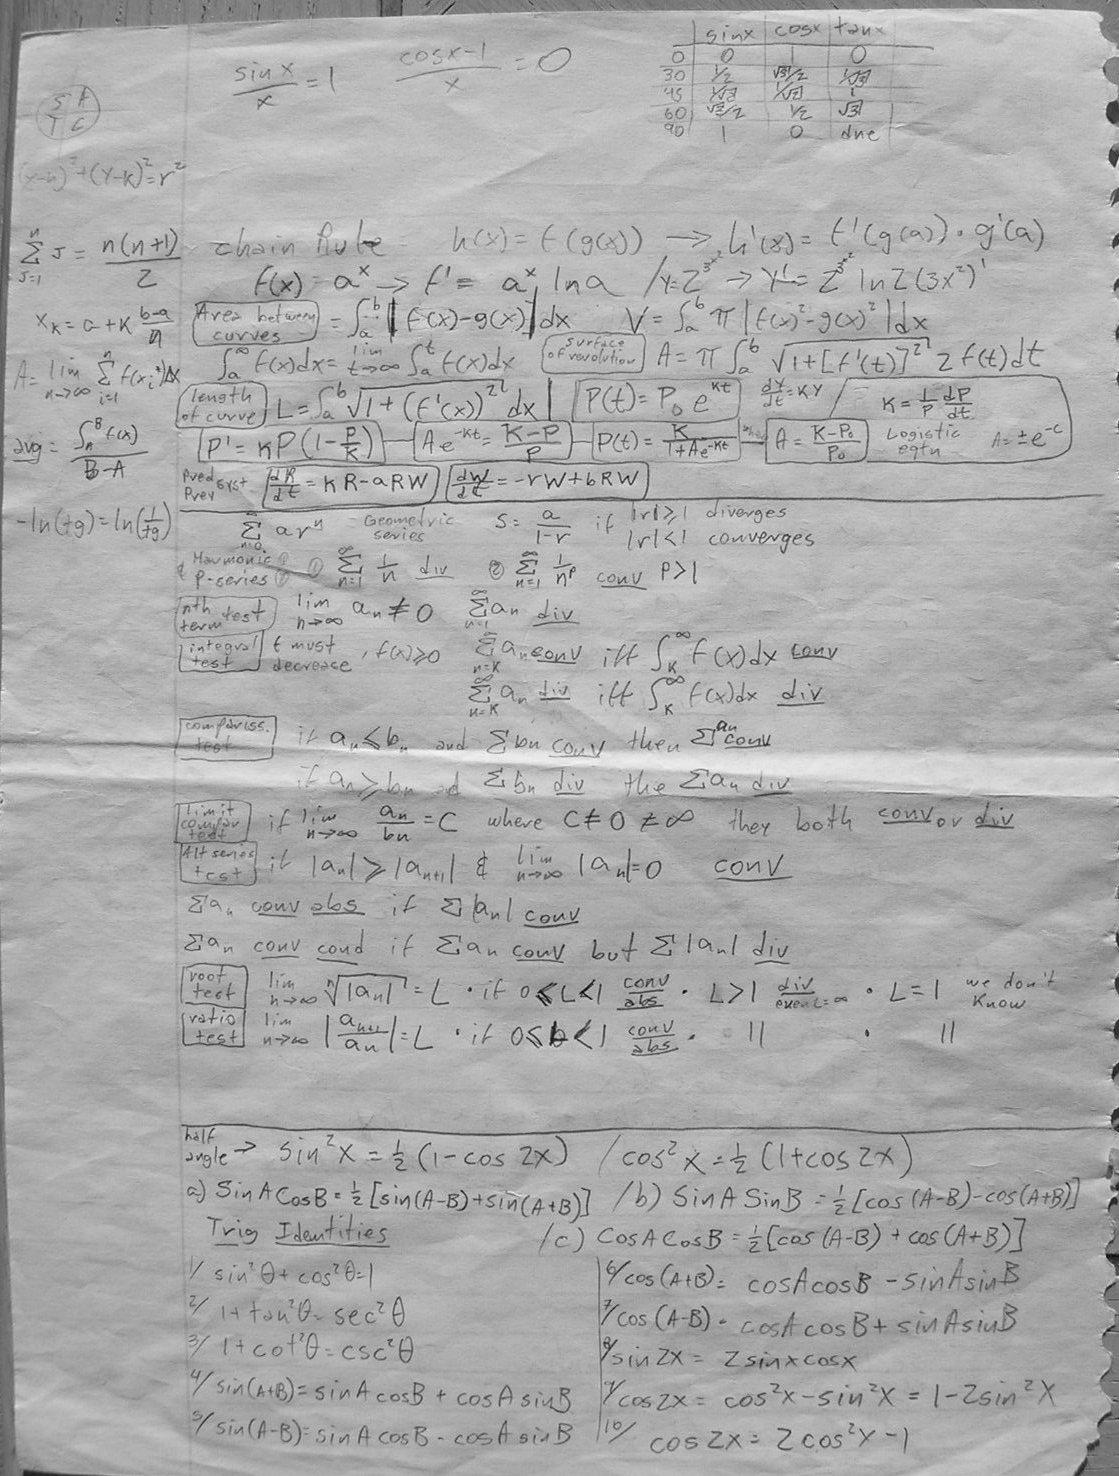 Situational Physics Cheat Sheet 2 | Wiring Diagram Database